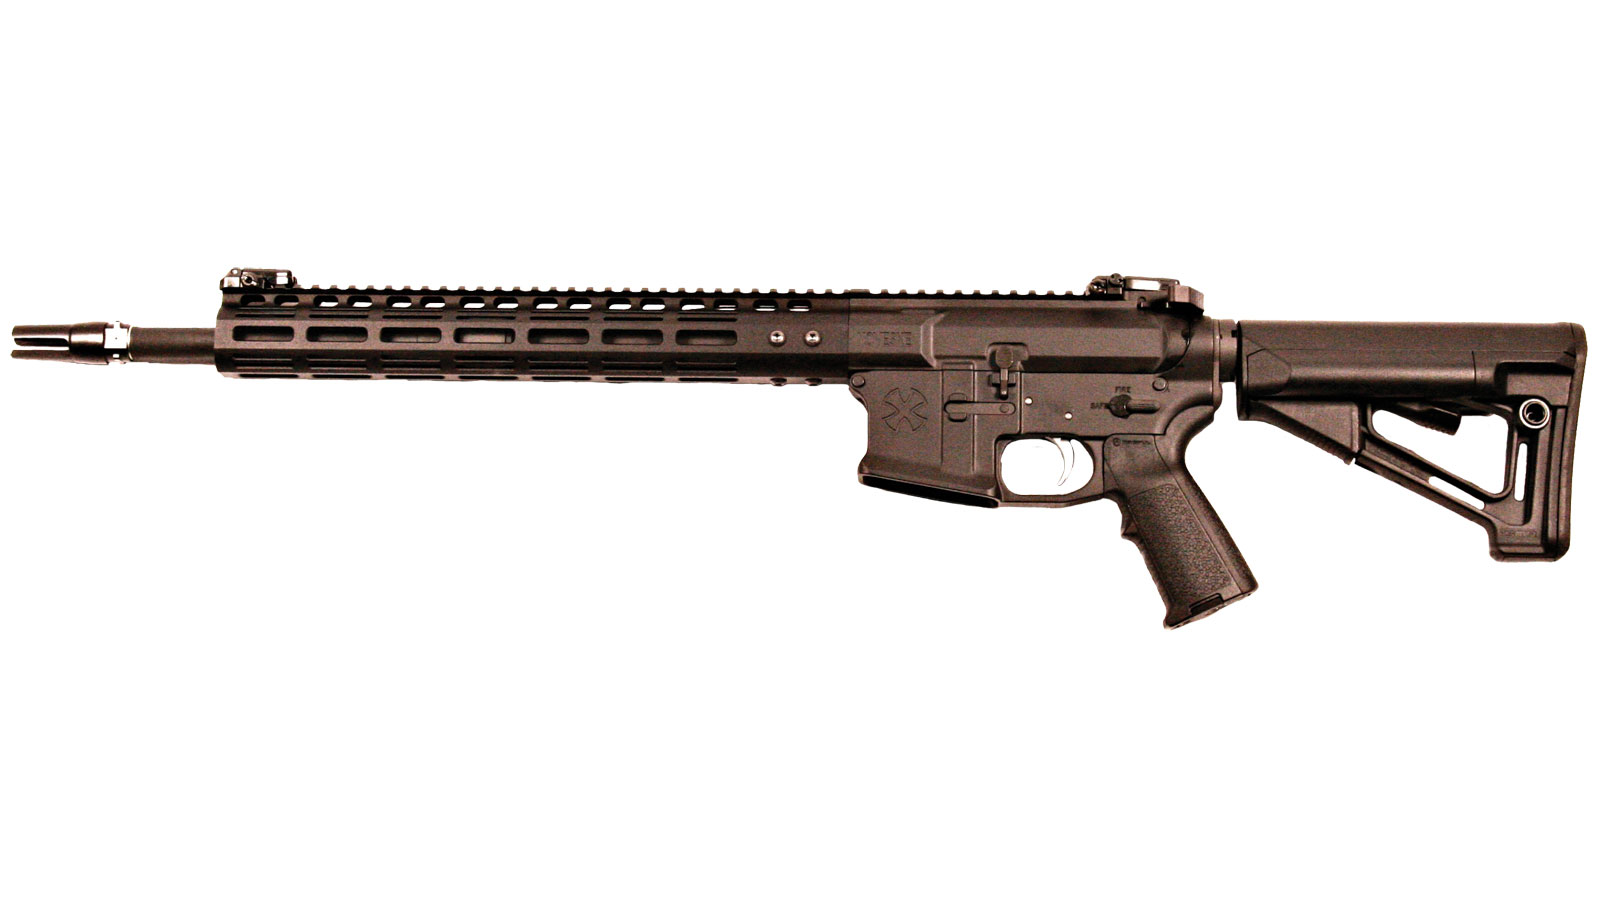 Noveske 02000430 Light Recce Gen III M-Lok Semi-Automatic 223 Remington|5.56 NATO 16 30+1 Magpul STR Black Stk Black Cerakote|Black Phosphate in.